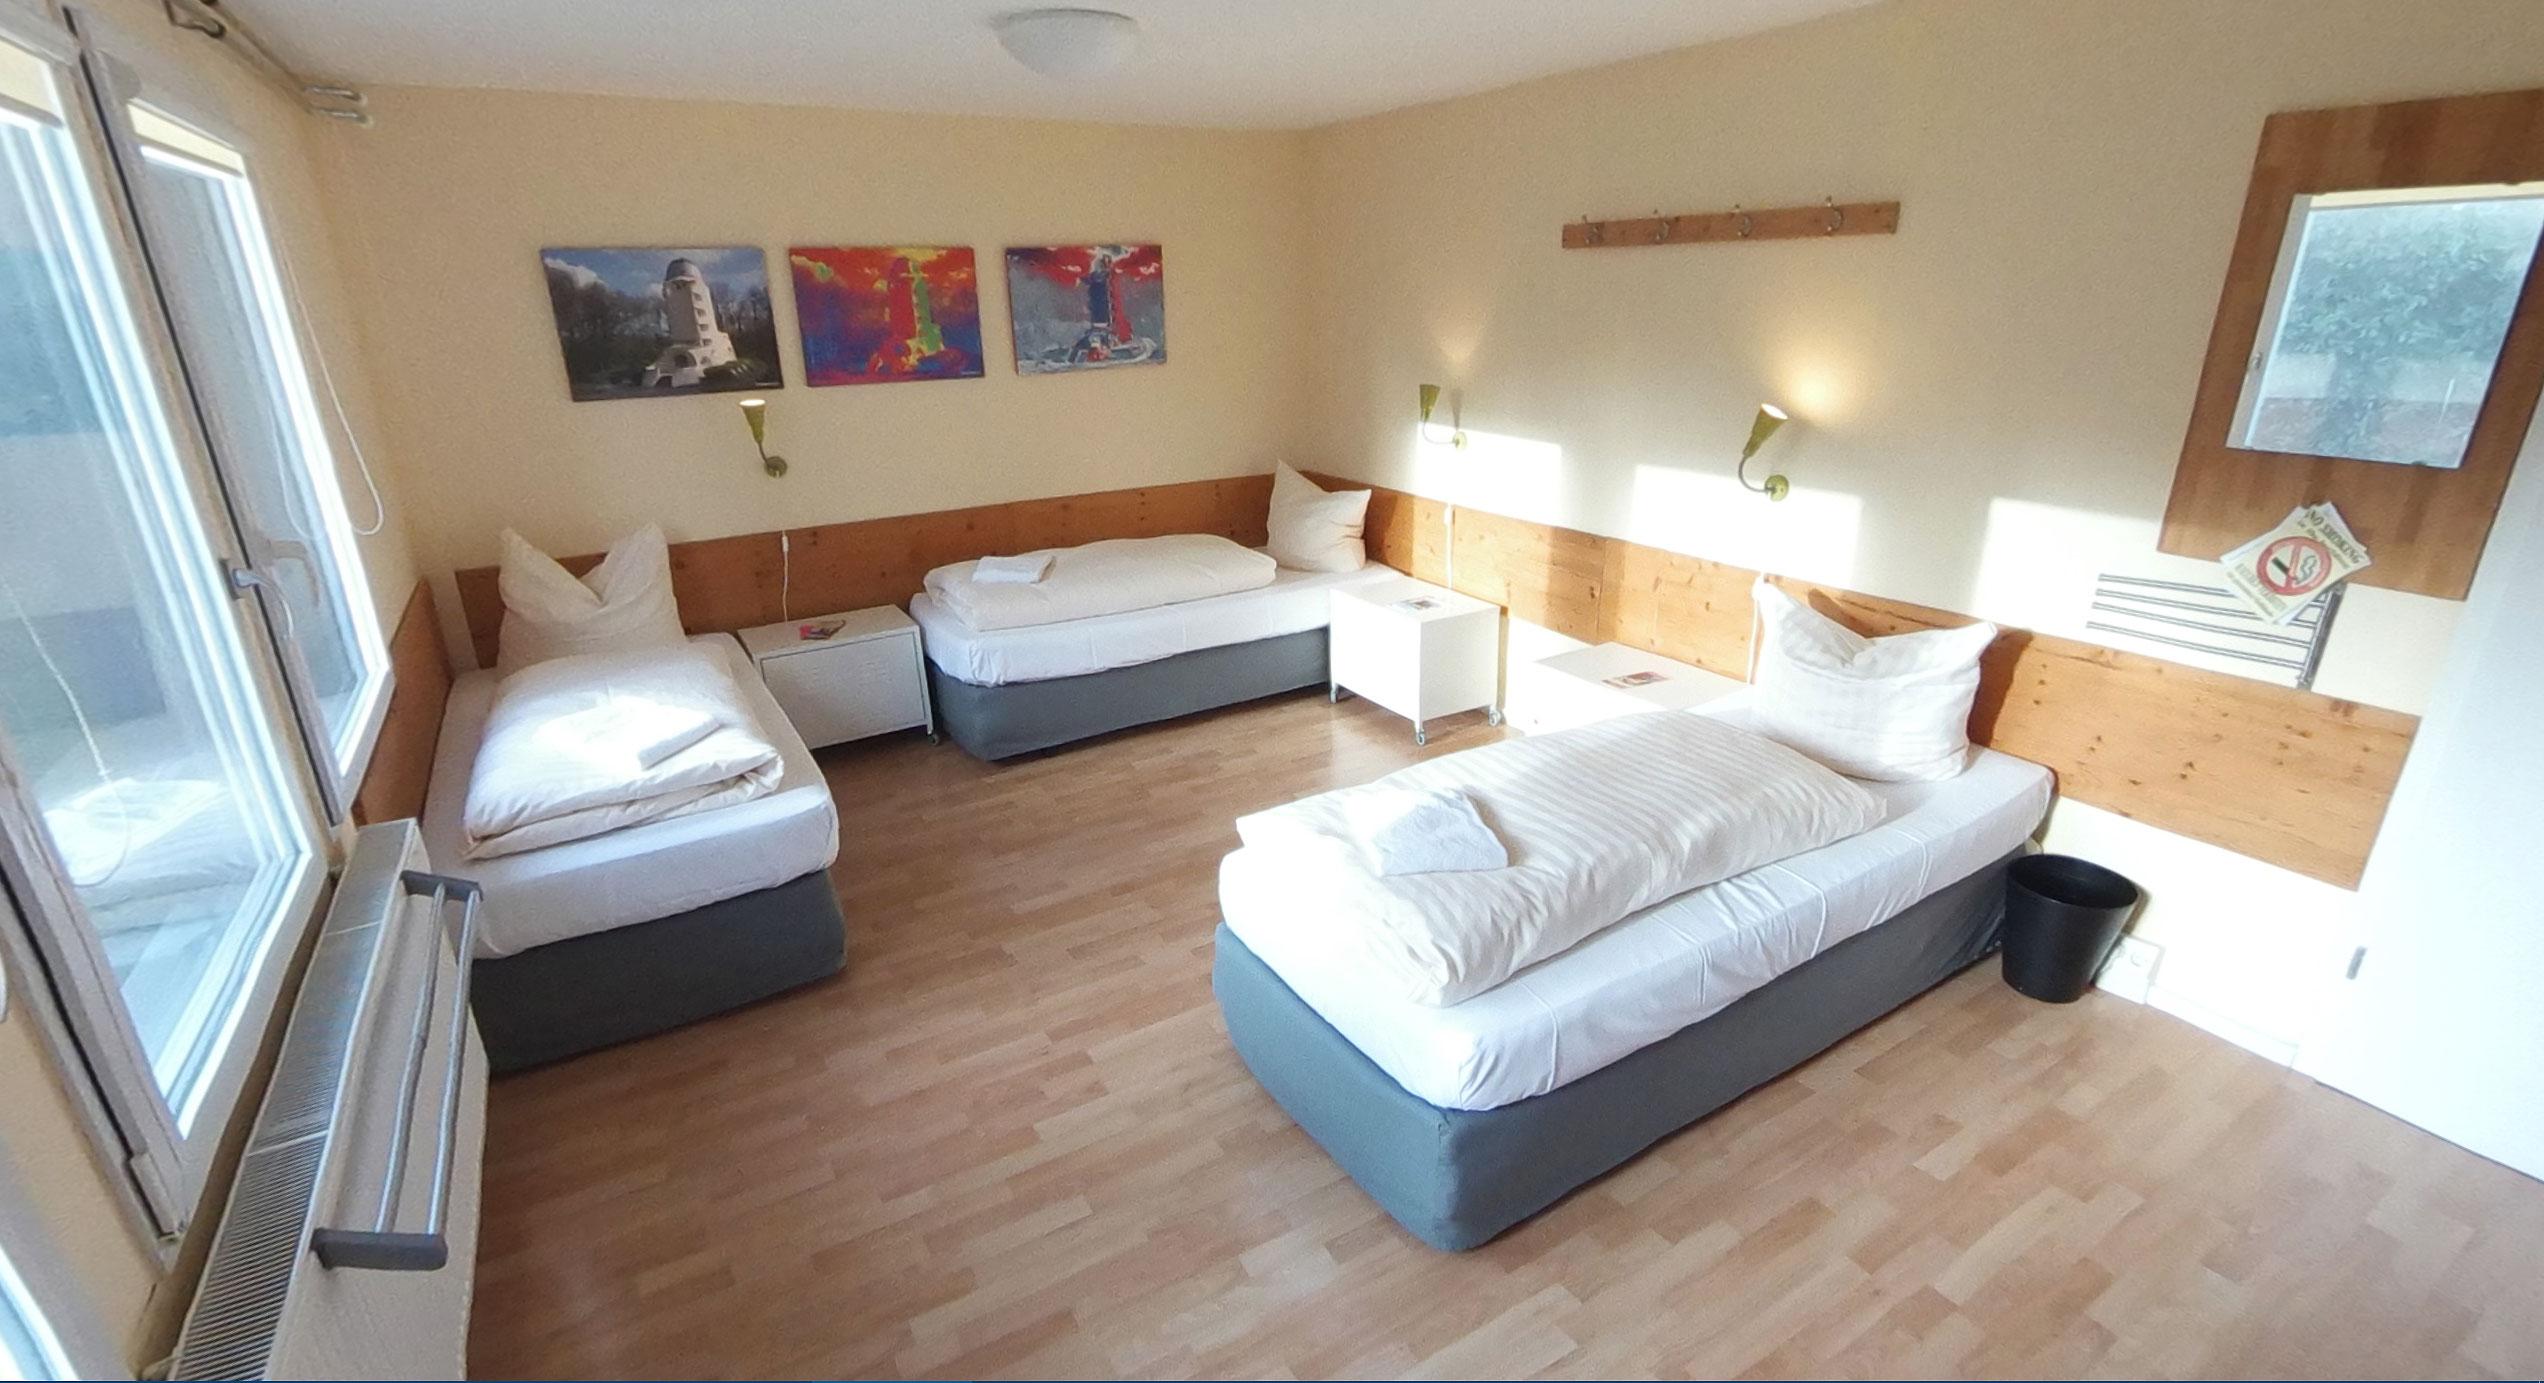 4 bett zimmer damen quartier potsdam hostel. Black Bedroom Furniture Sets. Home Design Ideas